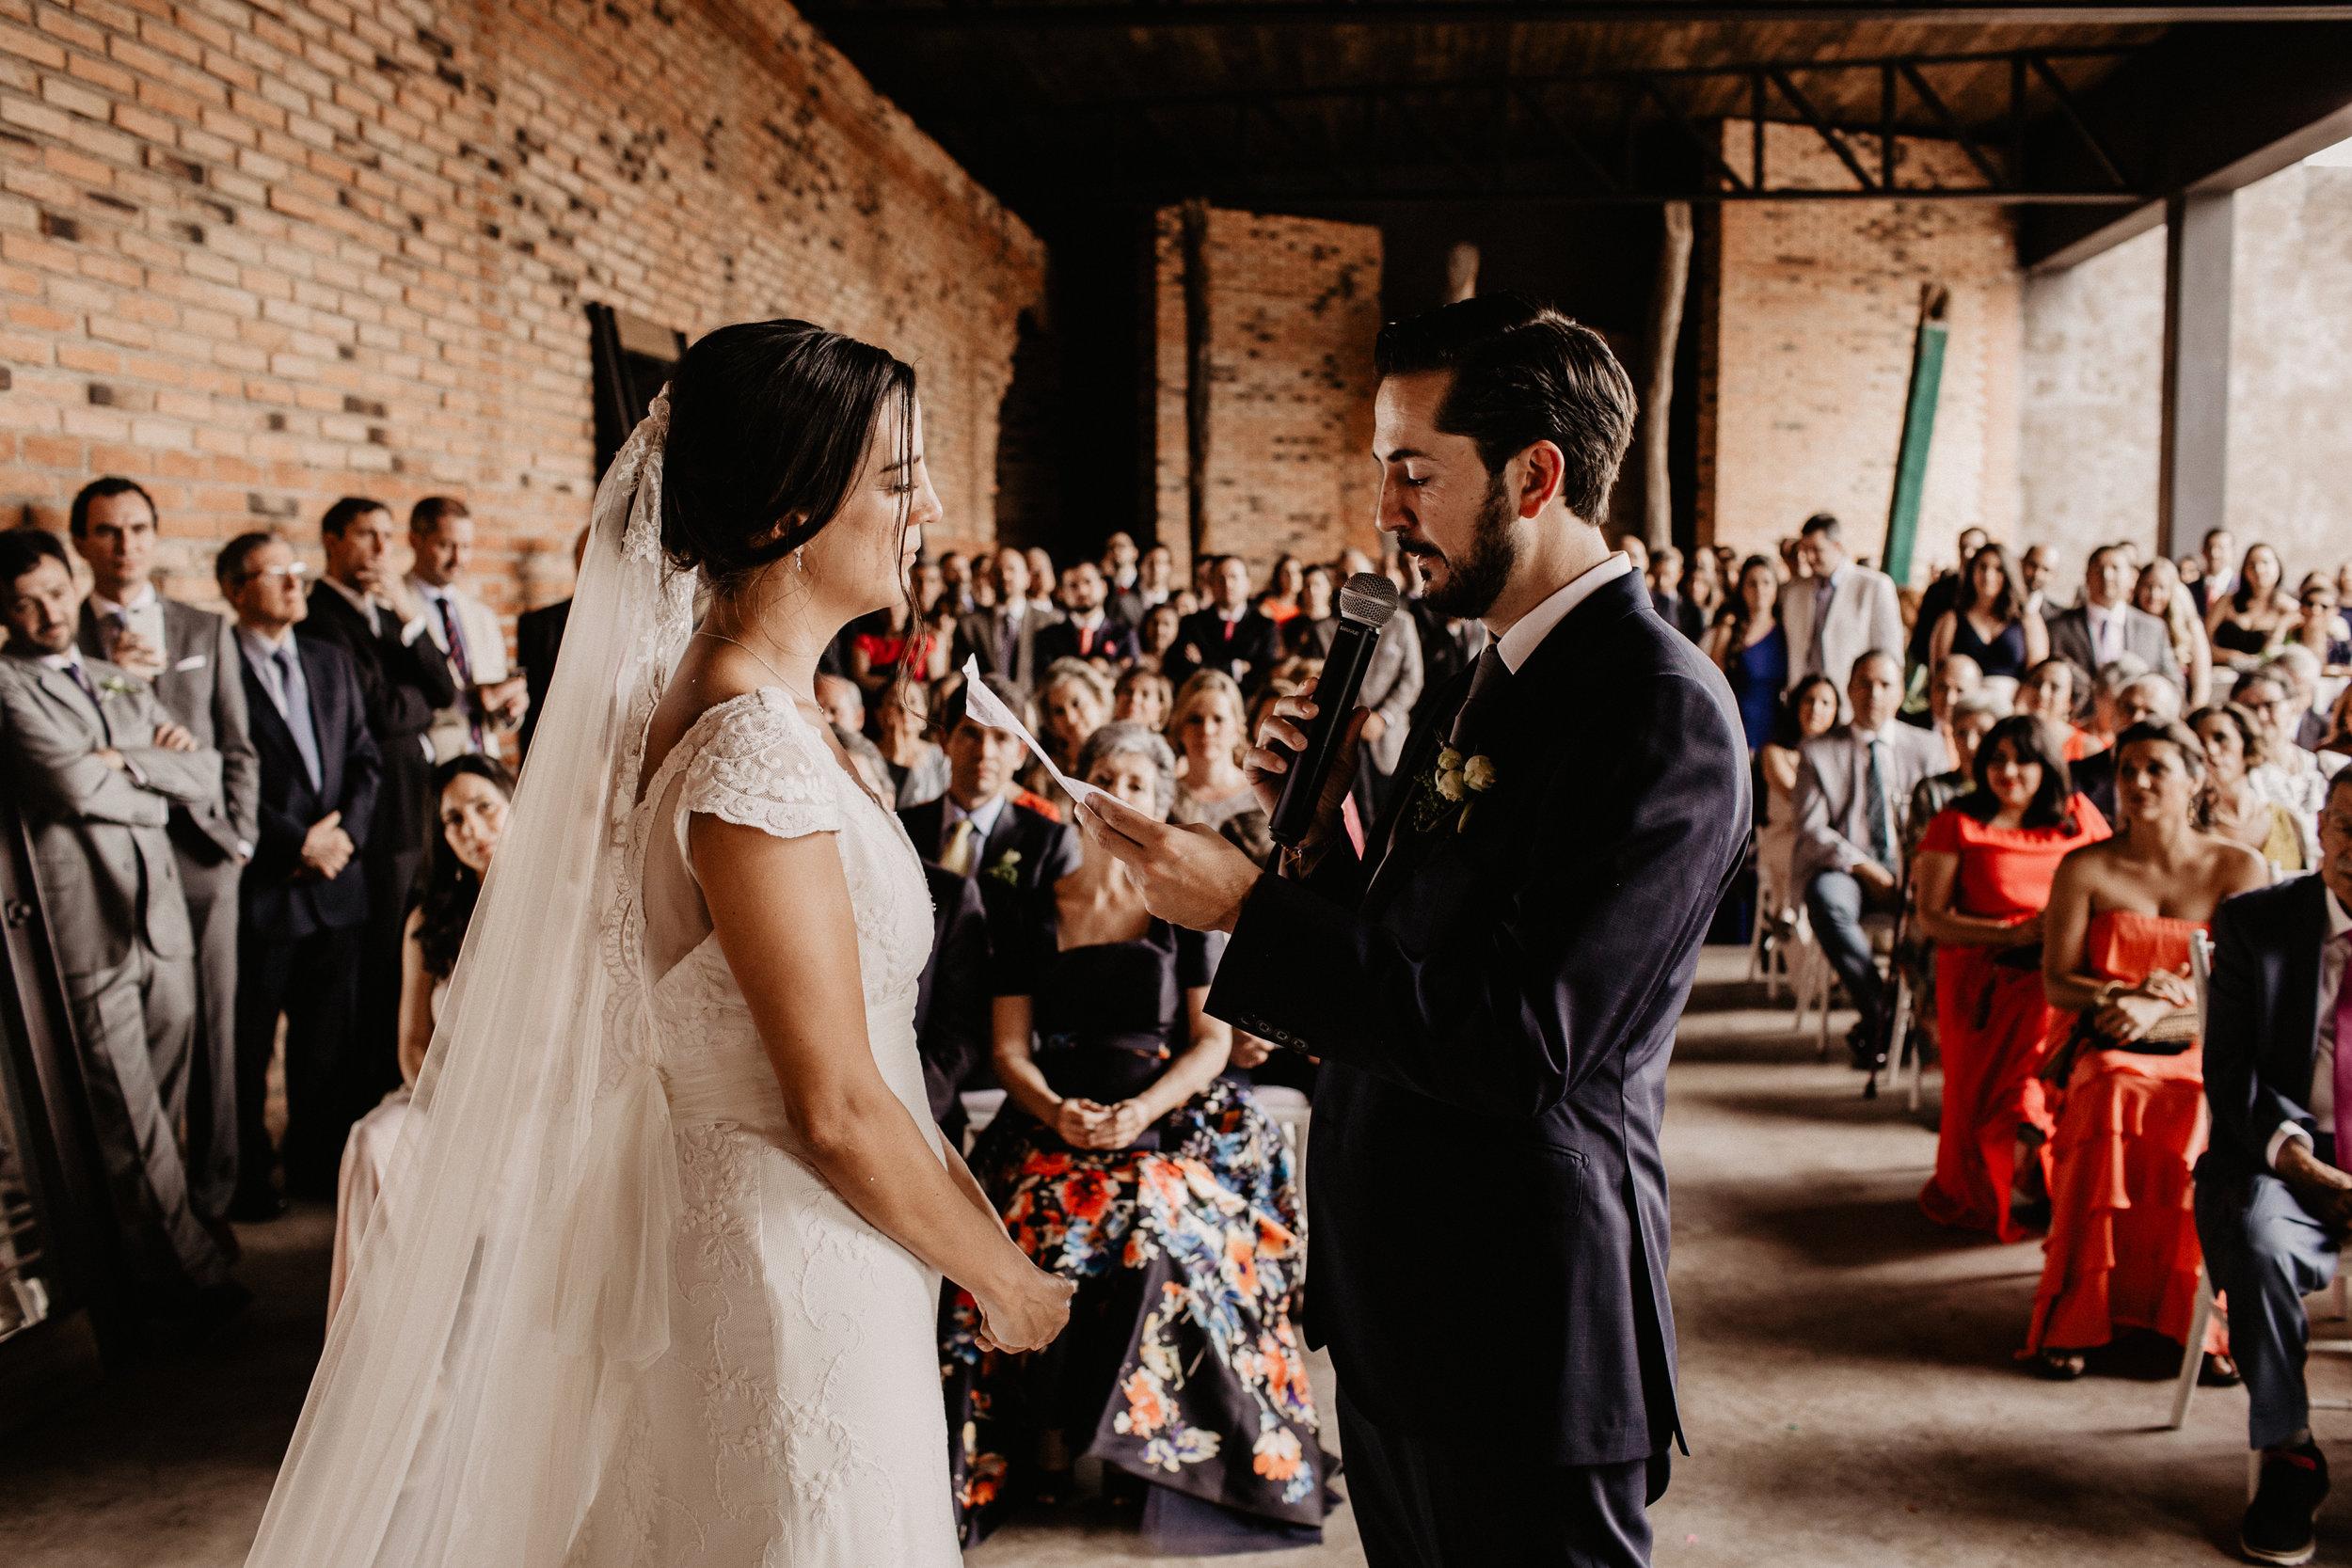 alfonso_flores_destination_wedding_photographer_pau_alonso_650.JPG